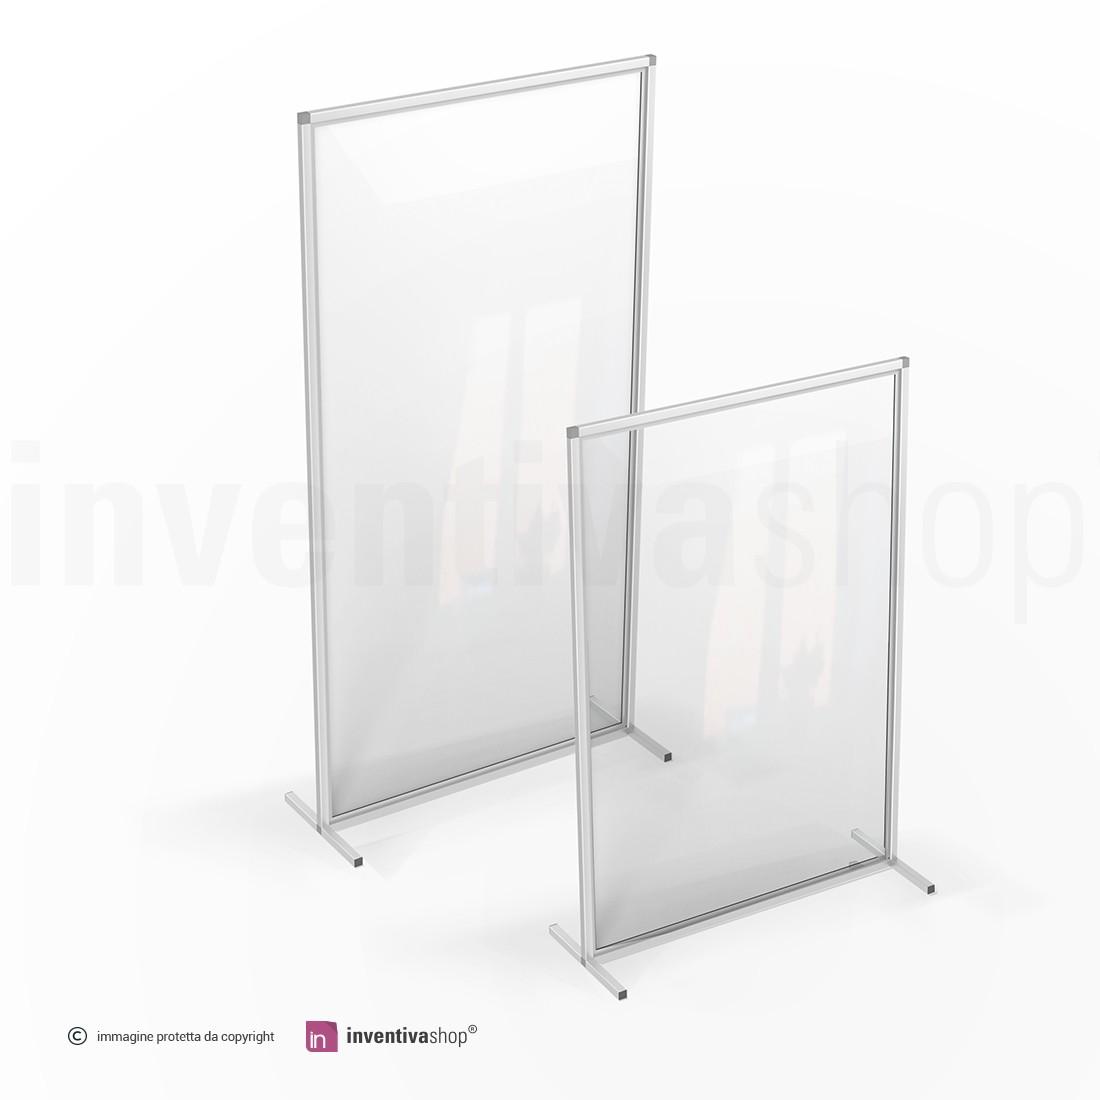 Divisori In Plexiglass Per Esterni pareti divisorie: plexiglass e alluminio -